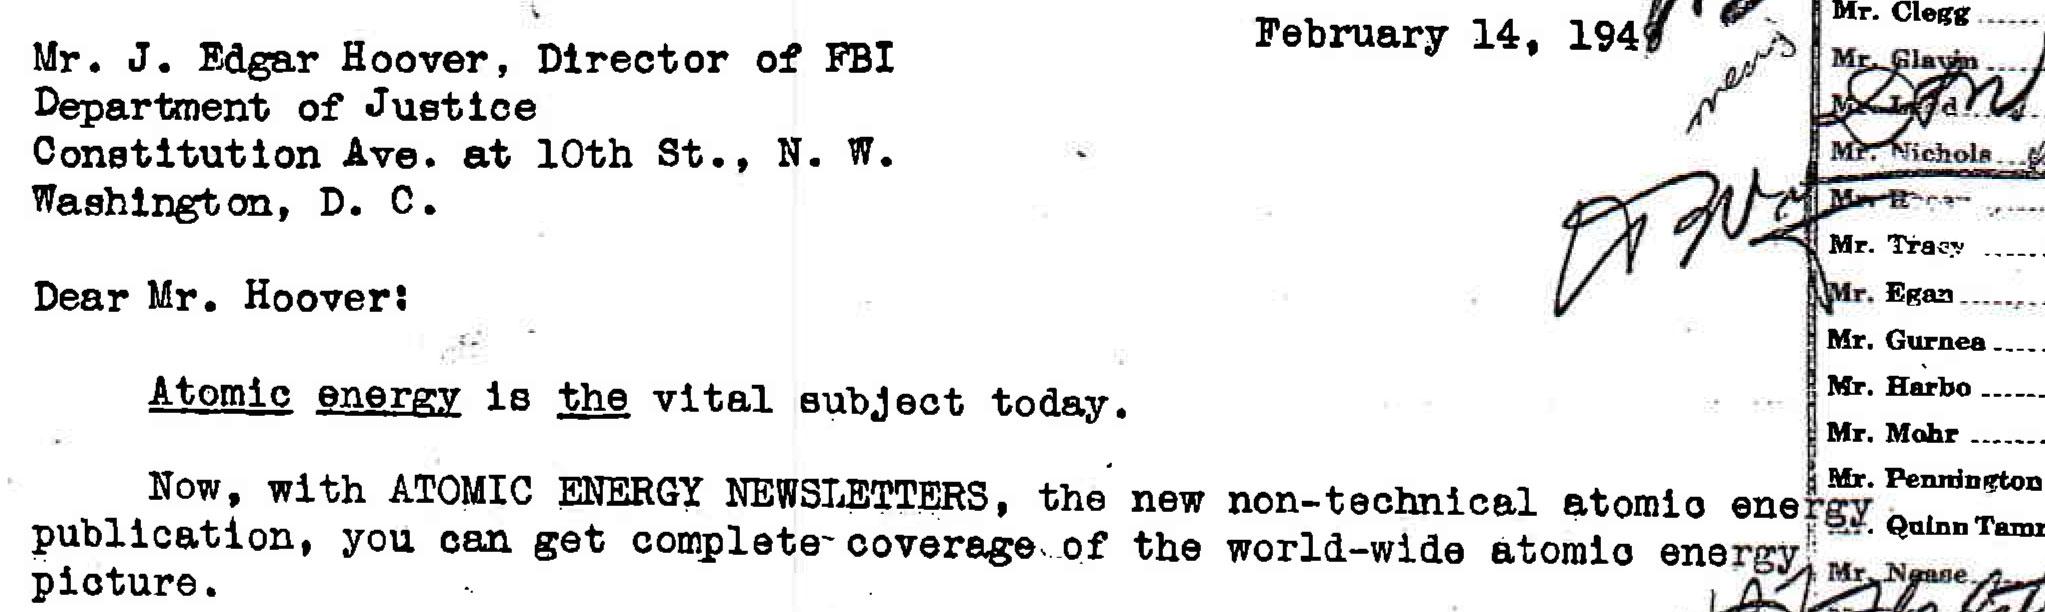 Press Release & FBI Memos